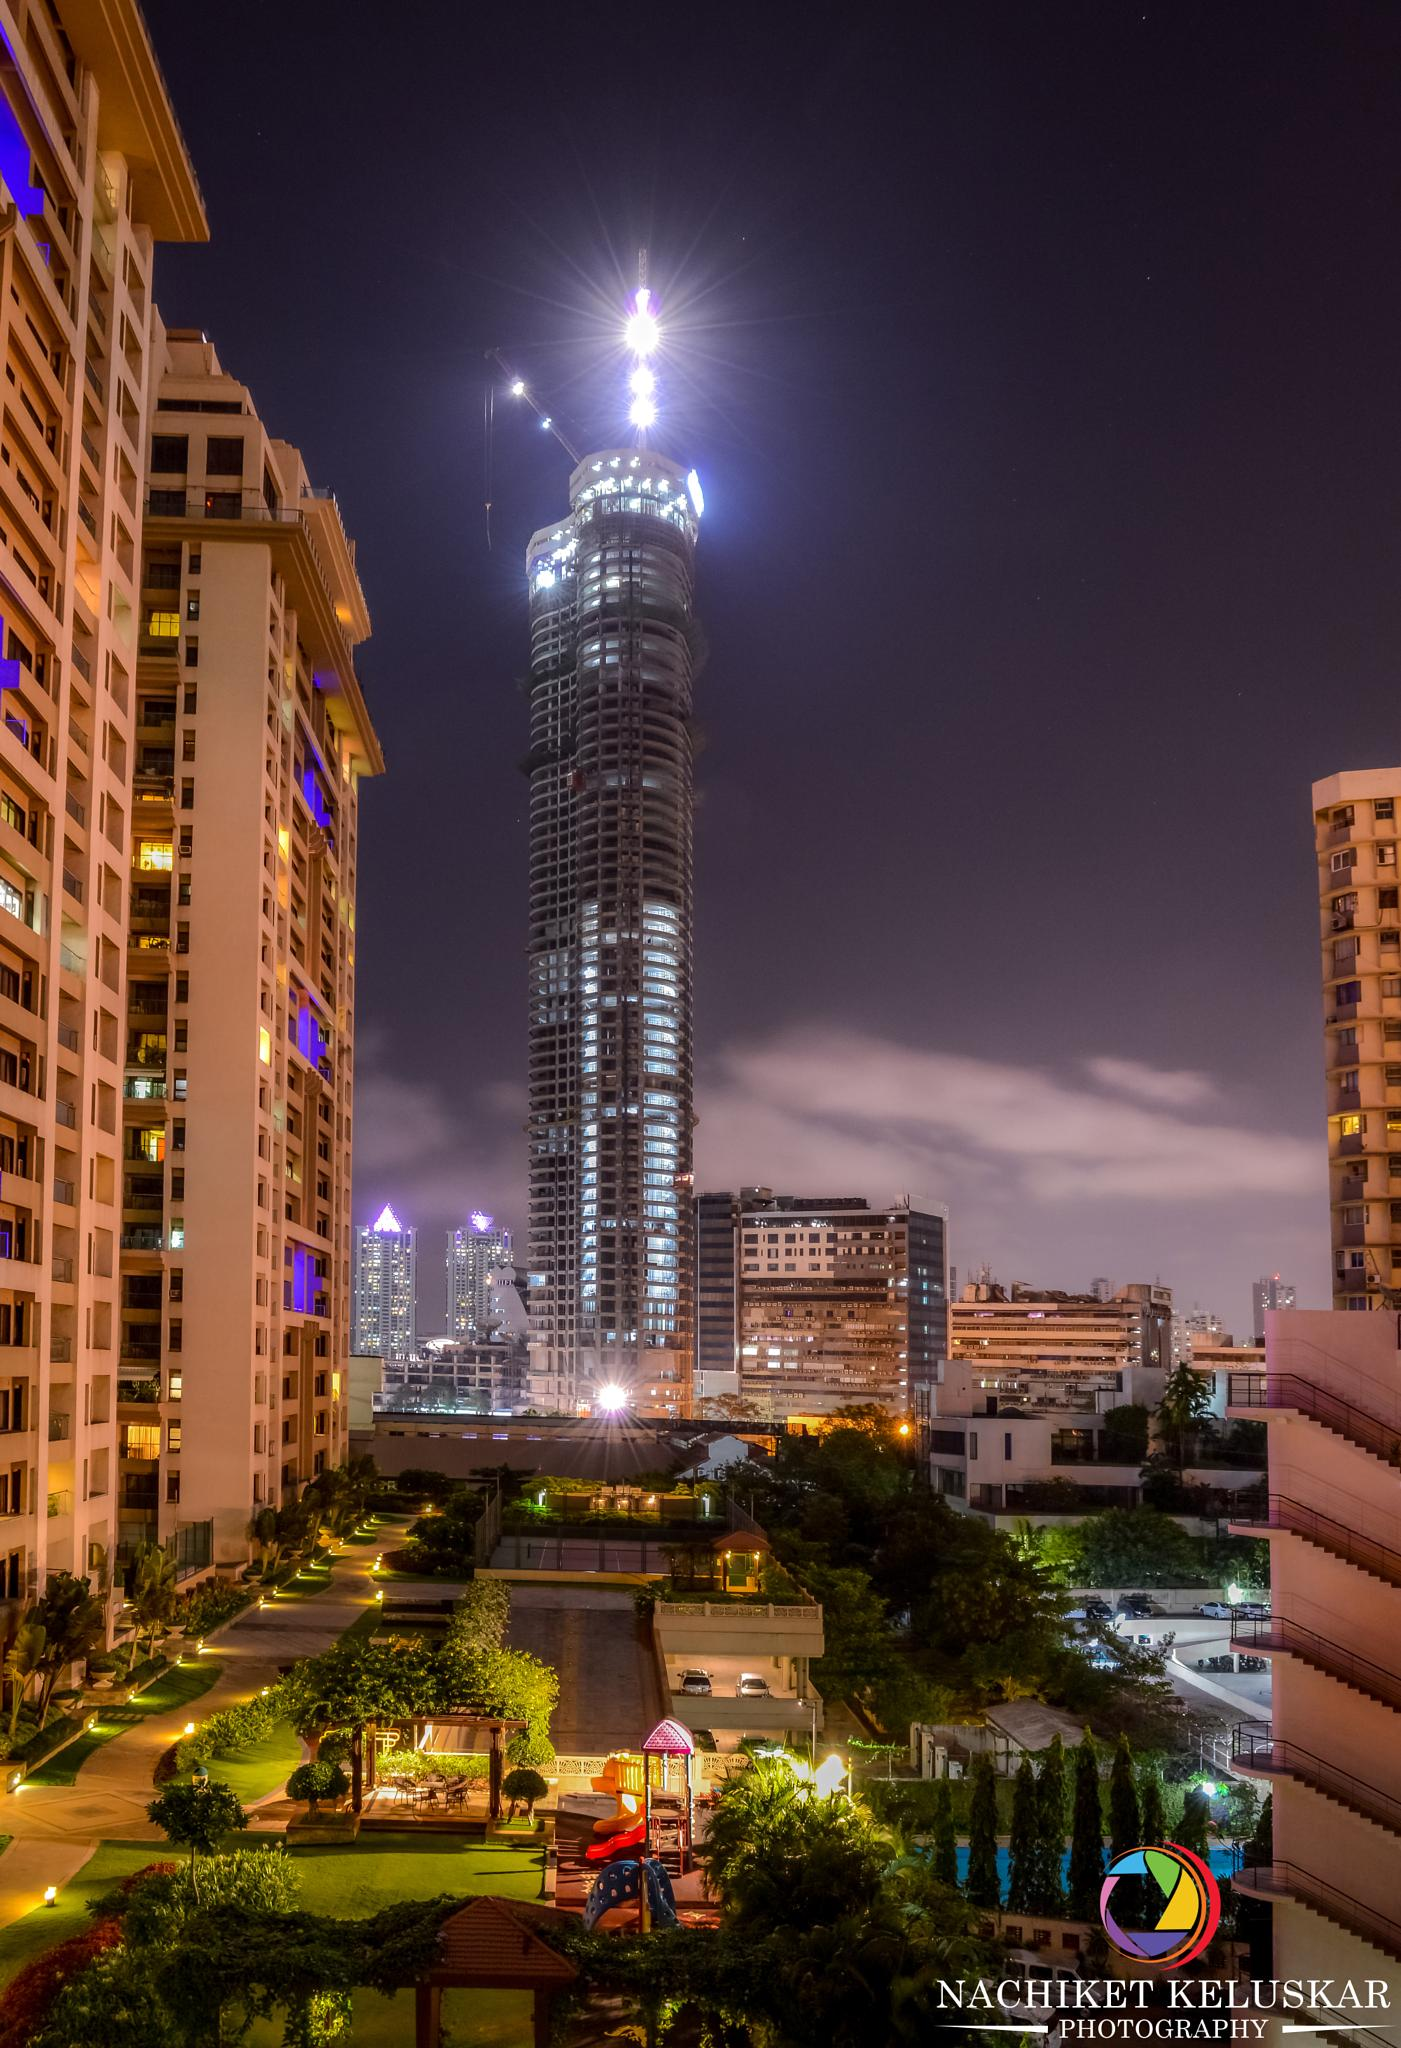 THE WORLD TOWER, MUMBAI by Nachiket Keluskar